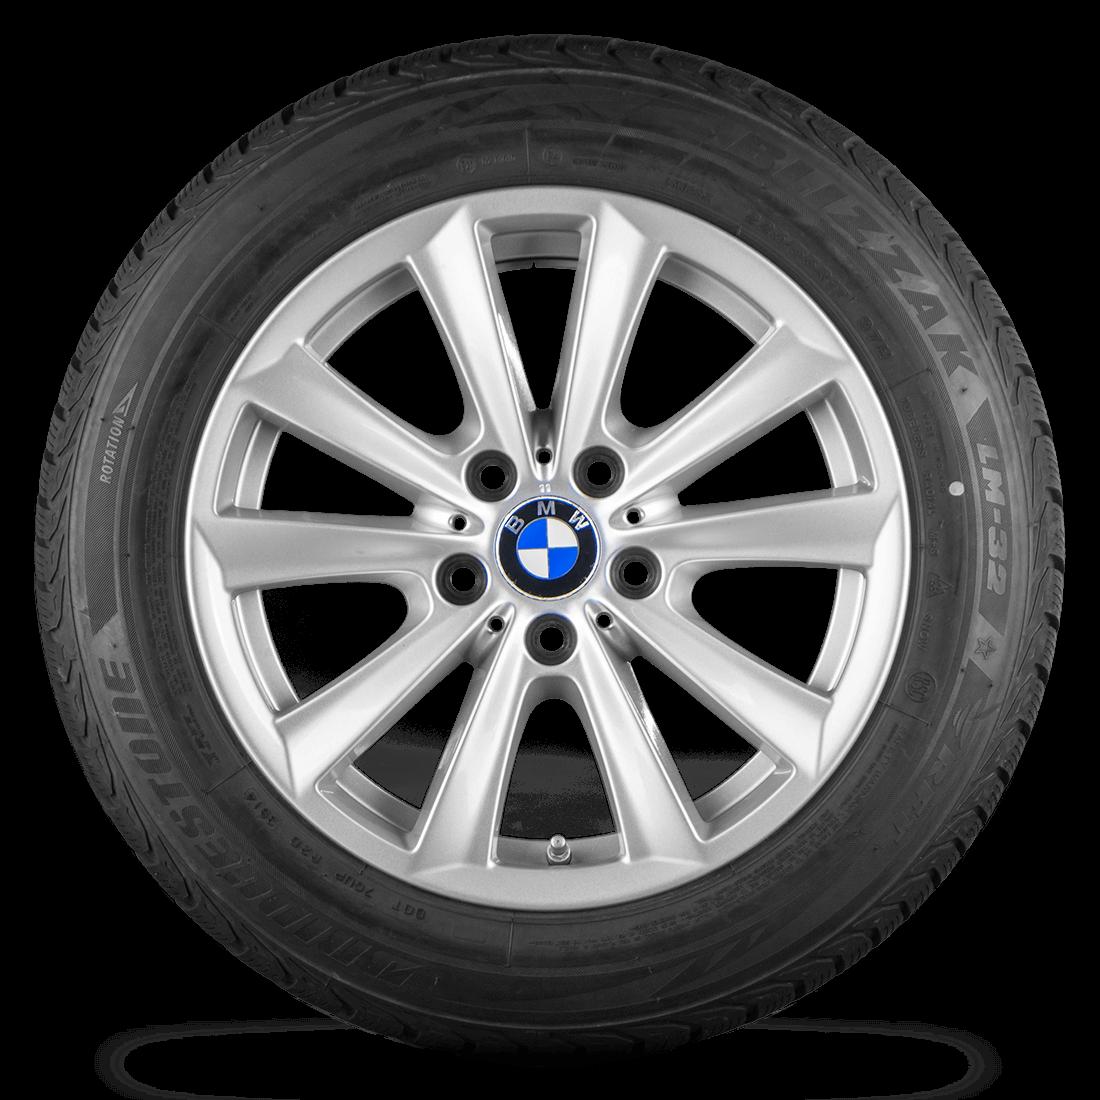 BMW 5er F10 F11 6er F12 F13 17 Zoll Alufelgen Winterreifen Felgen Styling 236